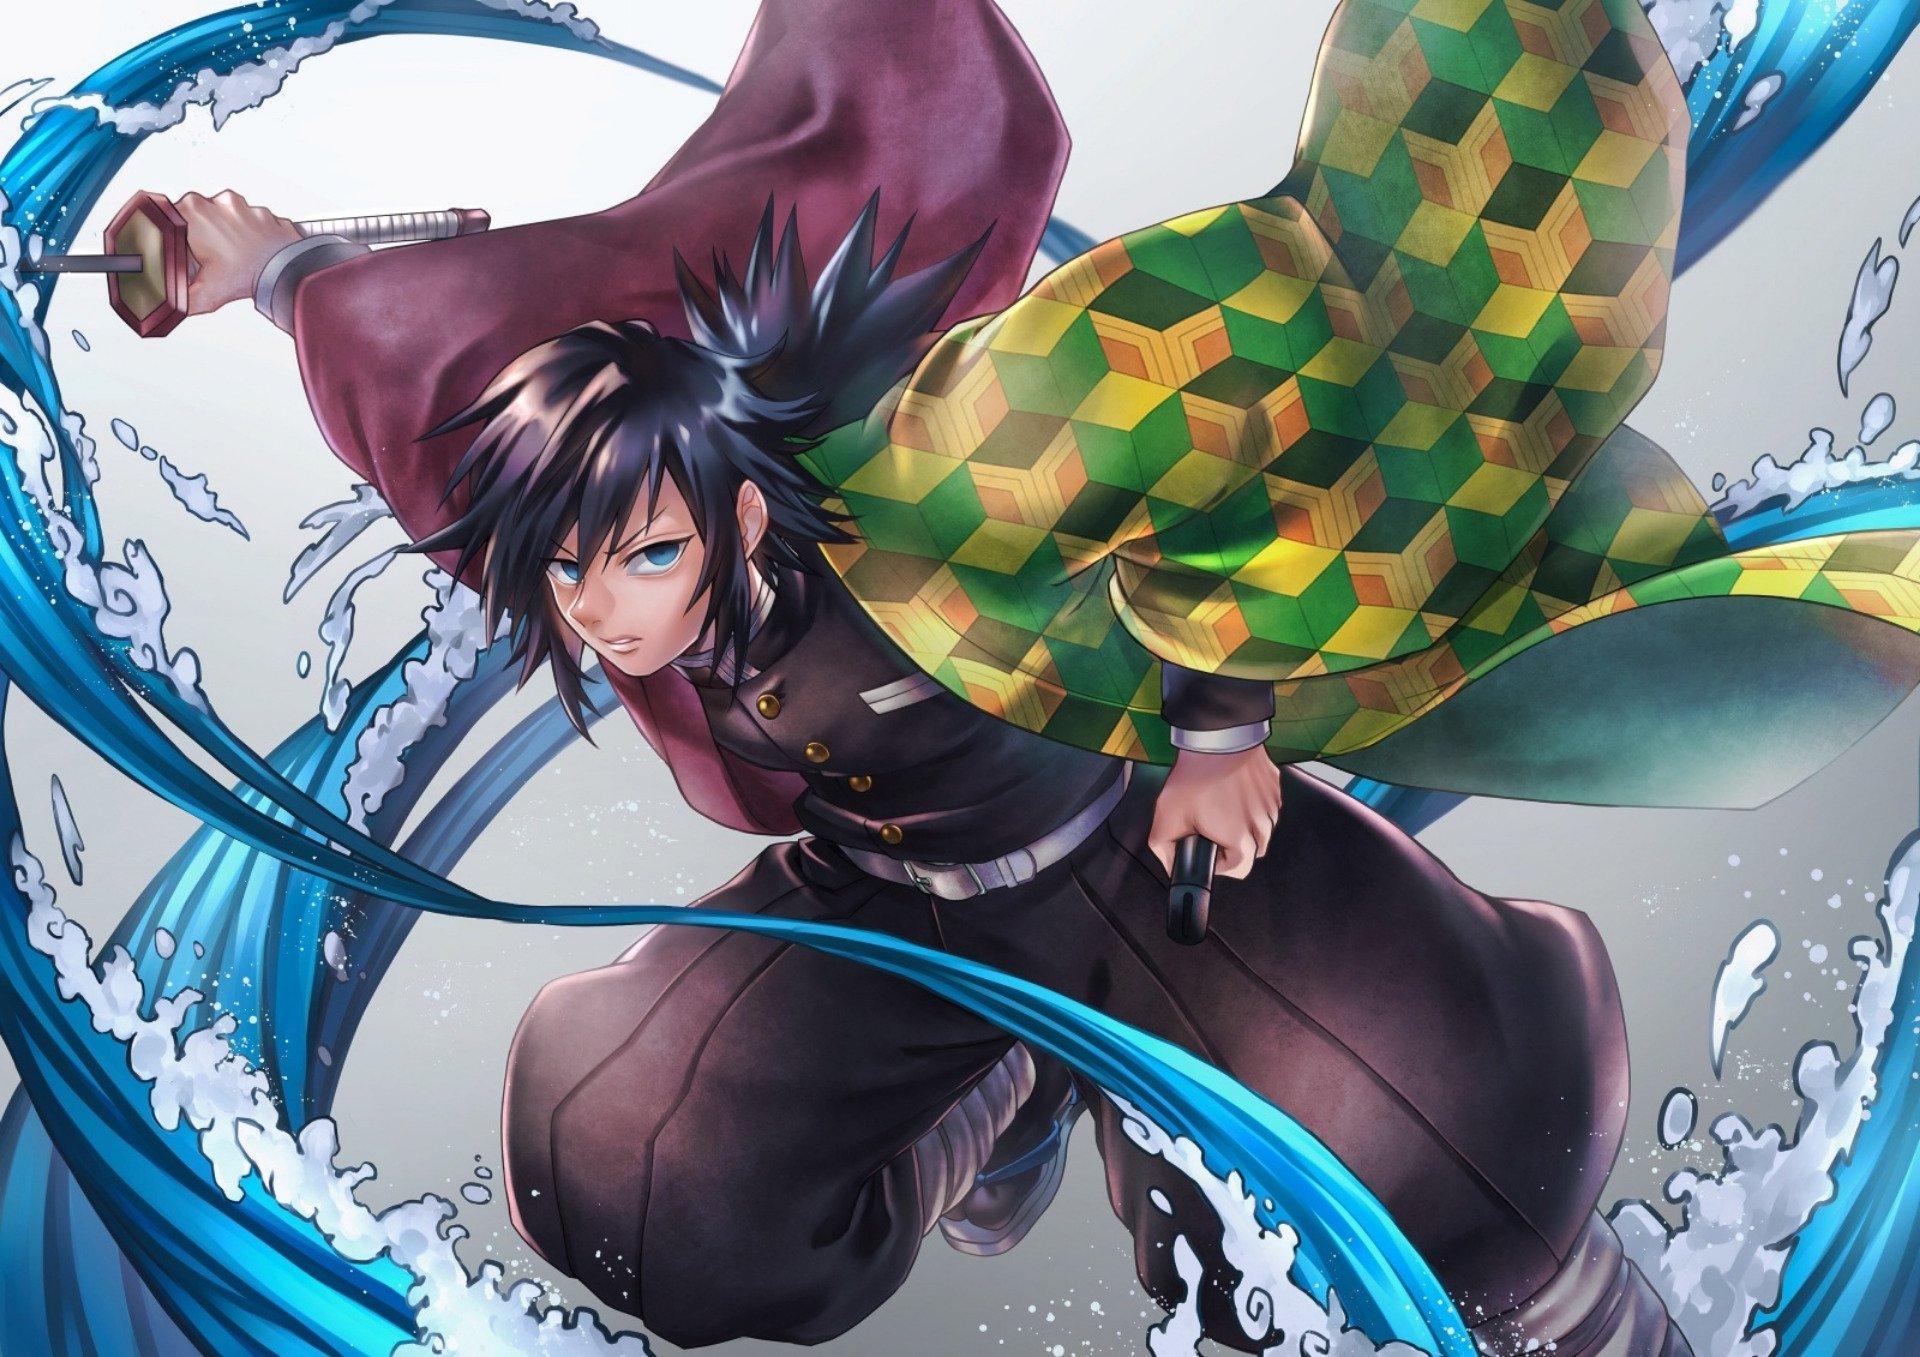 Fondos de pantalla Anime Giyu Tomioka de Guardianes de la Noche